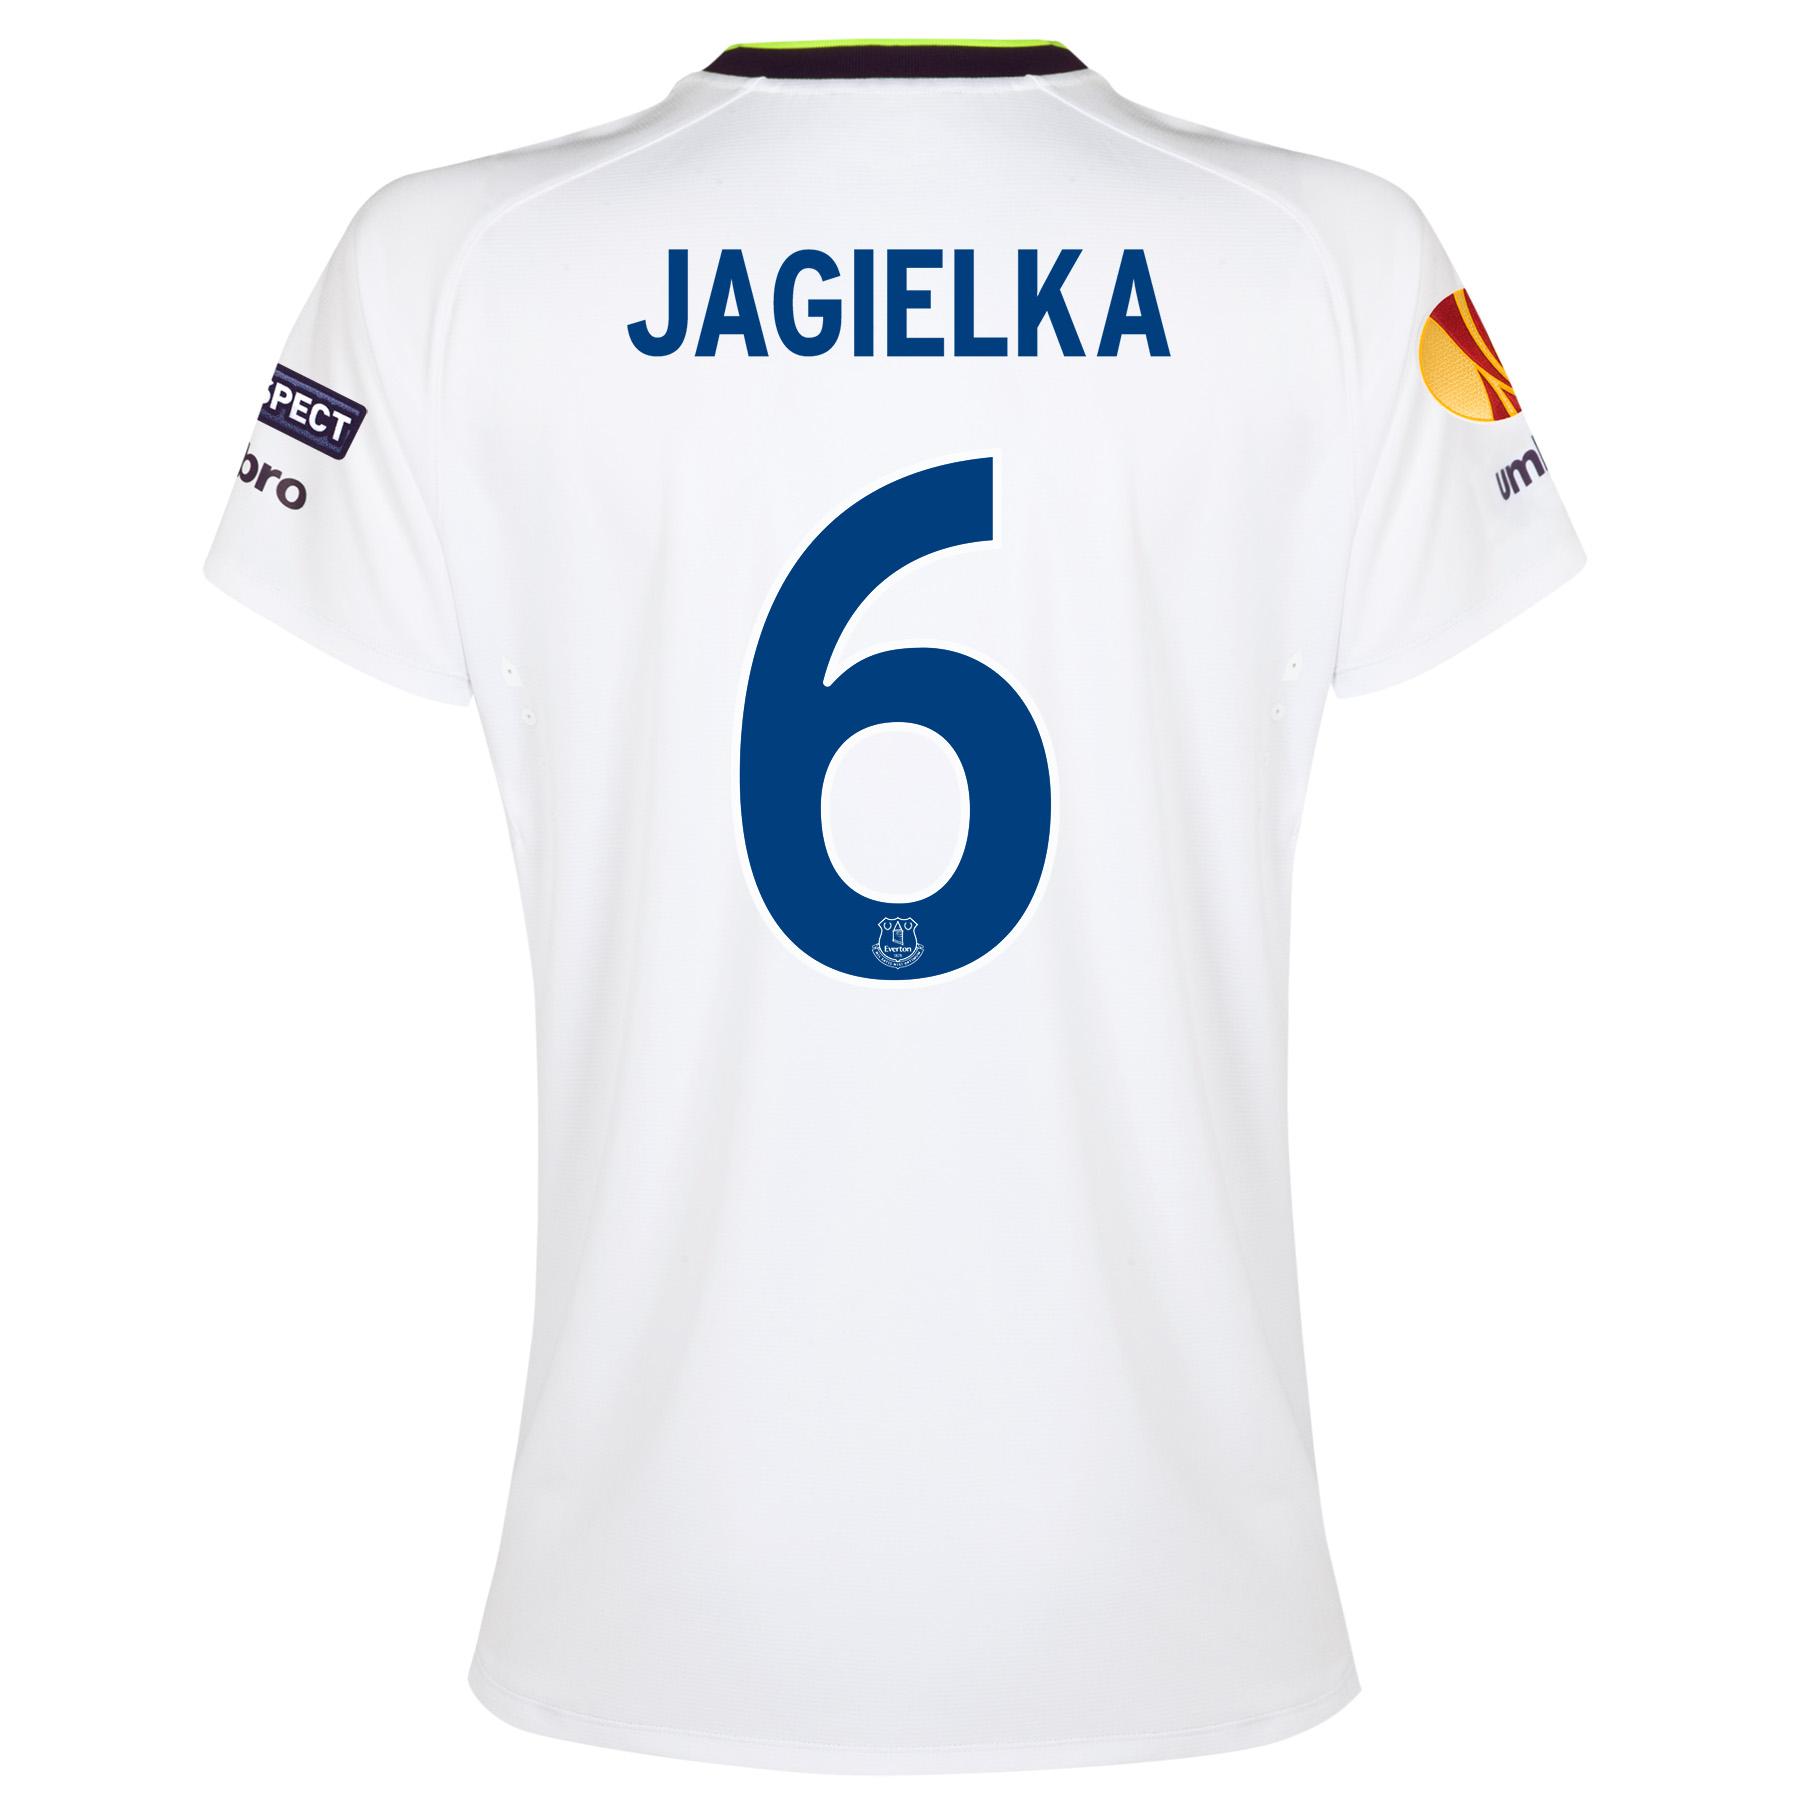 Everton UEFA Europa League 3rd Shirt 2014/15 - Womens with Jagielka 6 printing